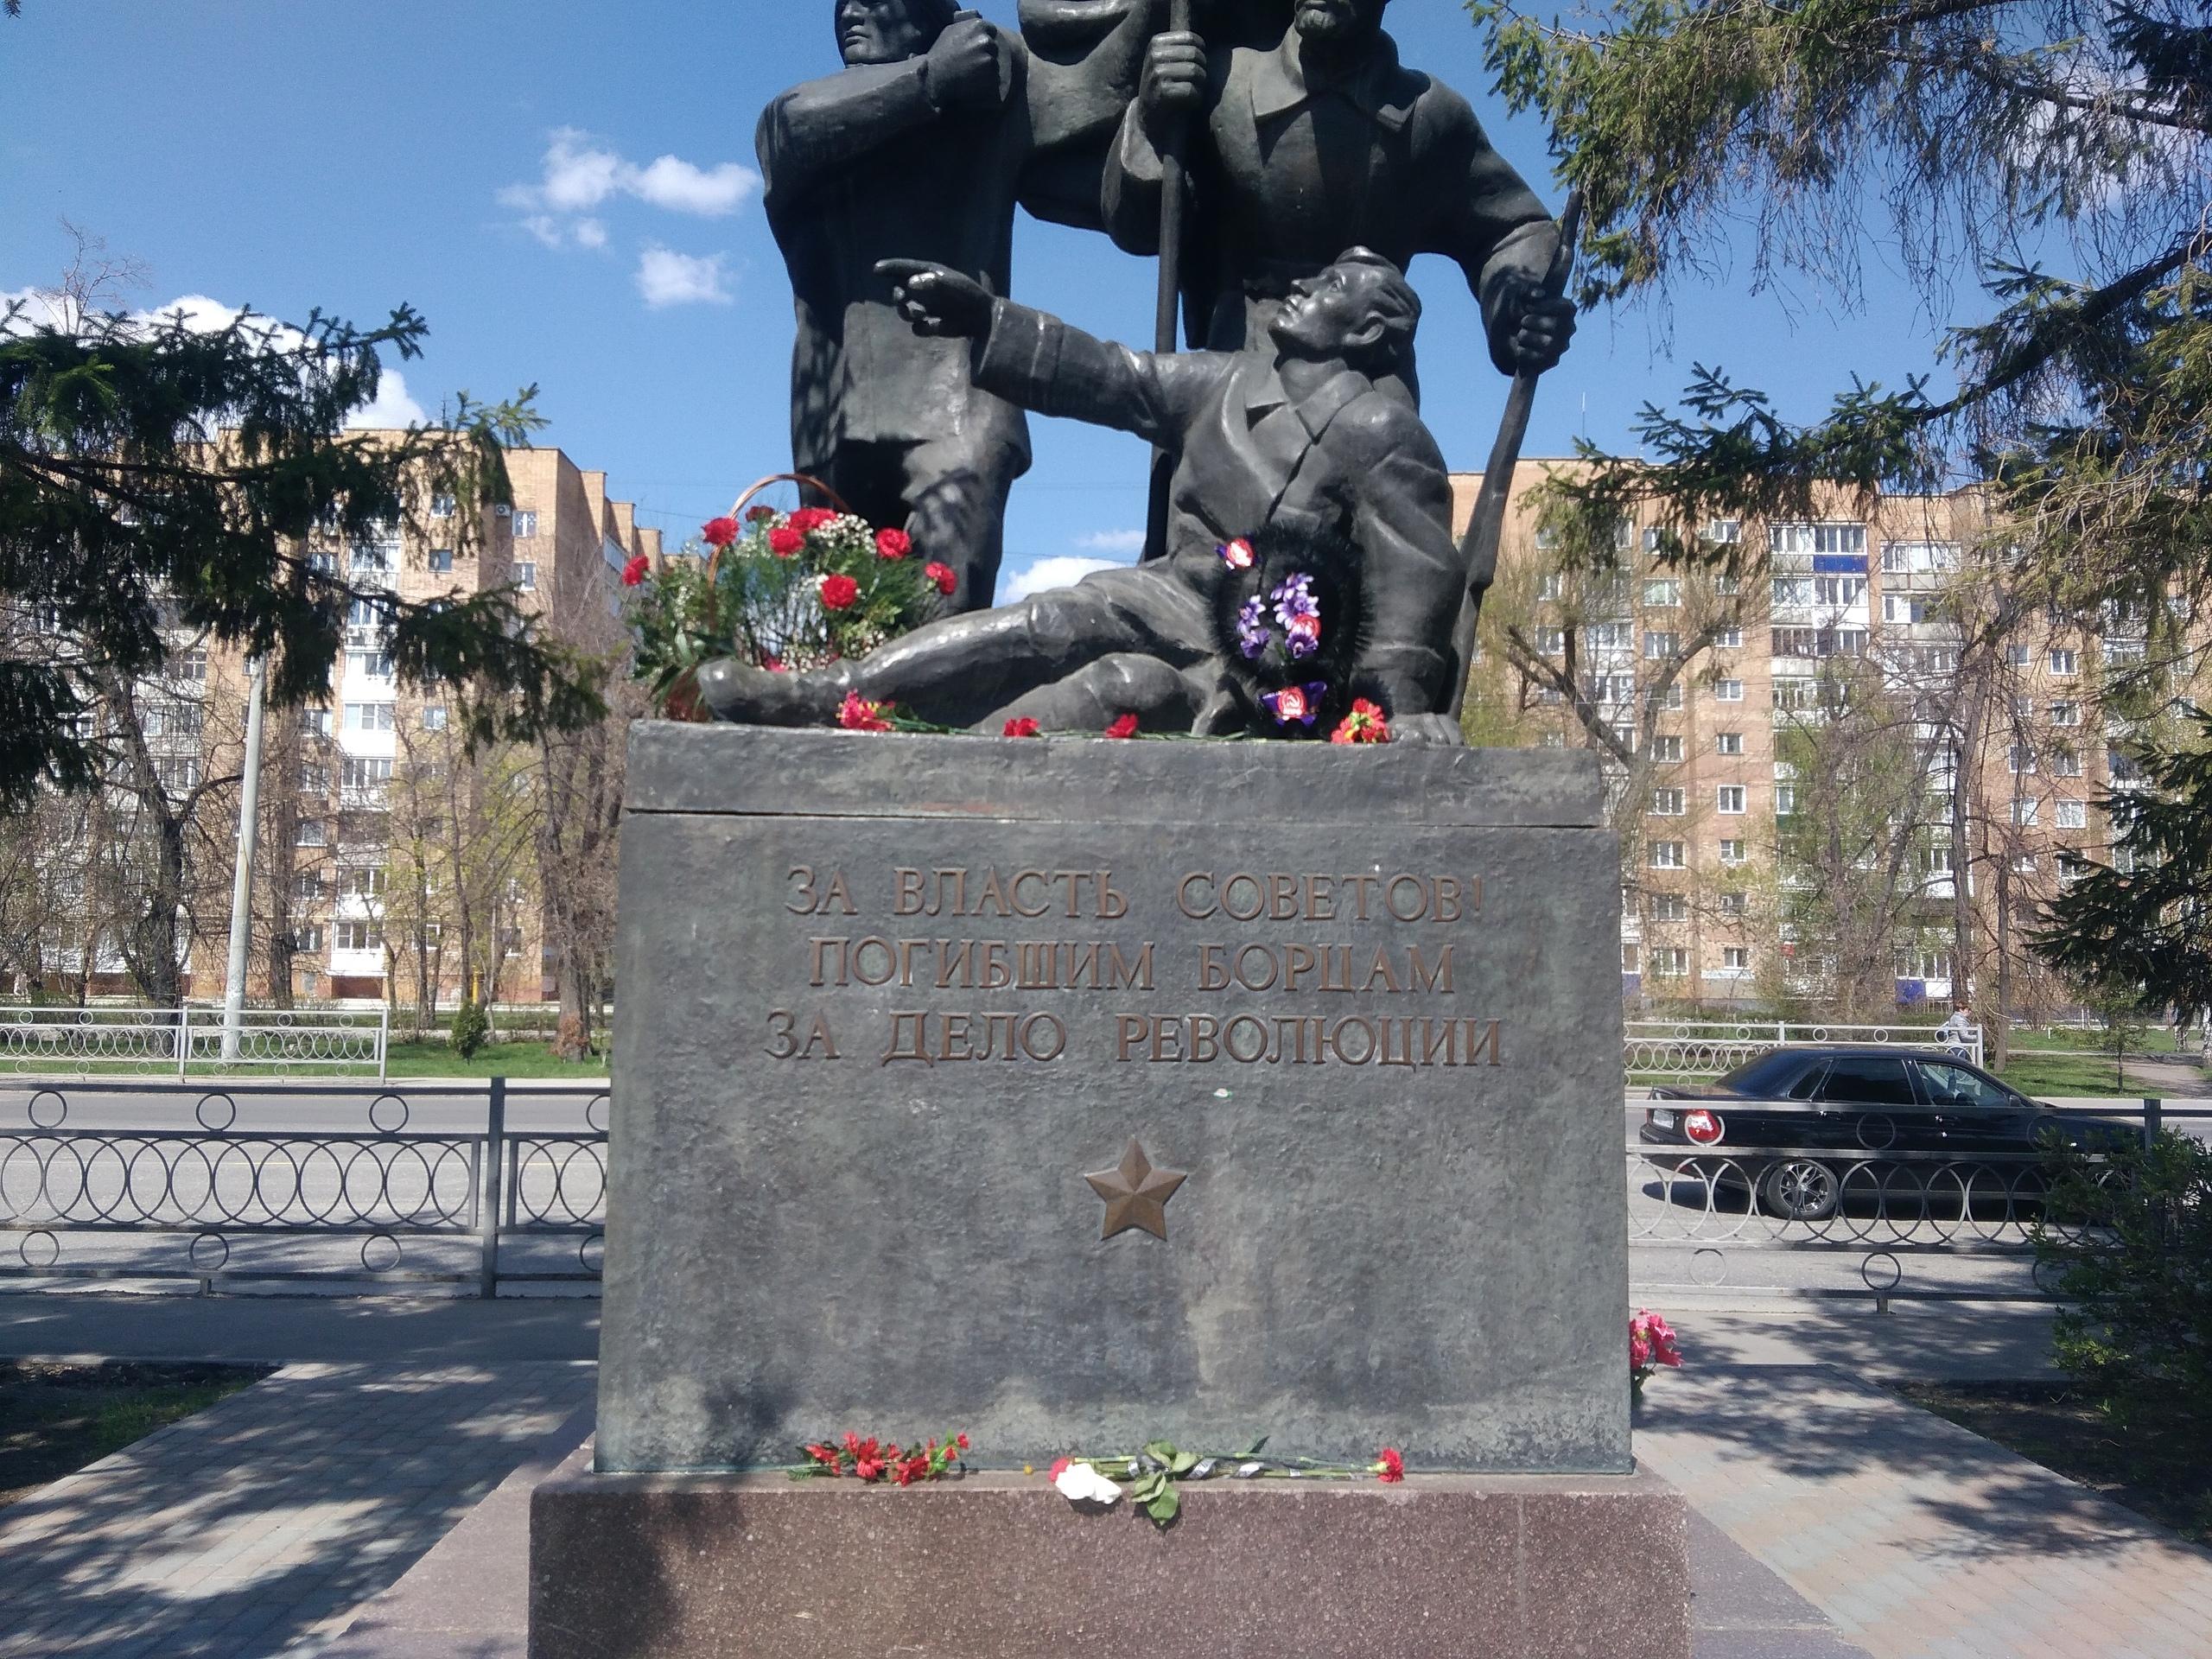 Сызрань КПРФ 1 мая 2019